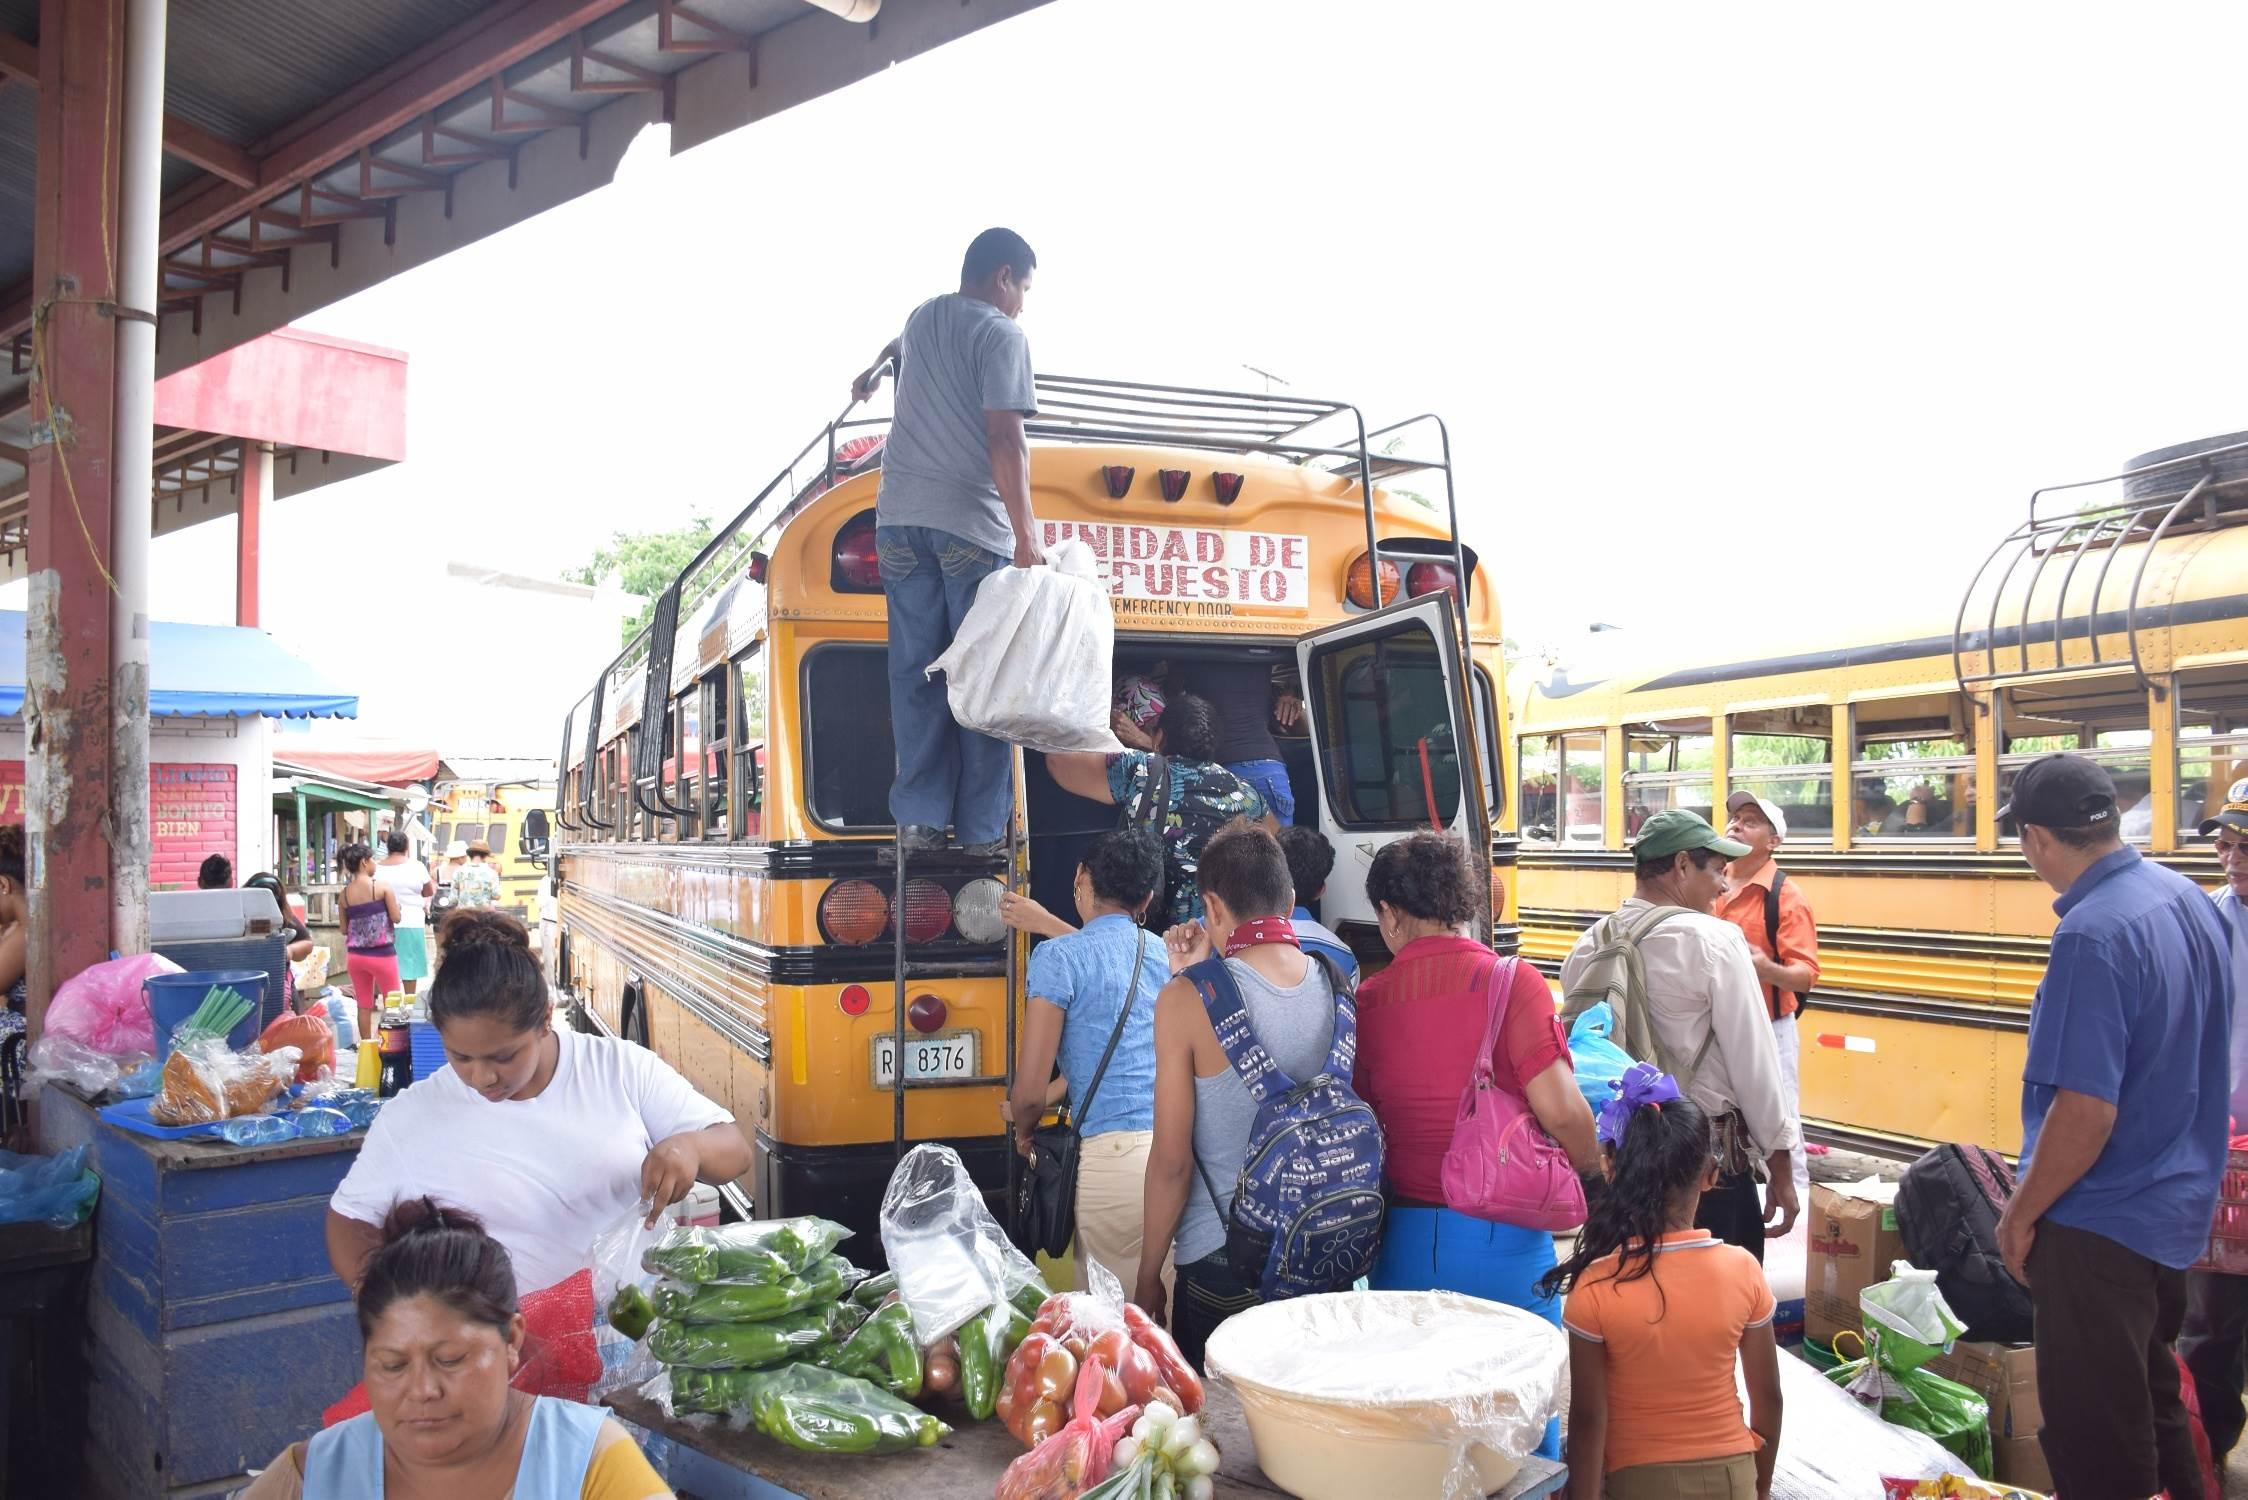 Costa Rica to Nicaragua Border Crossing Guide